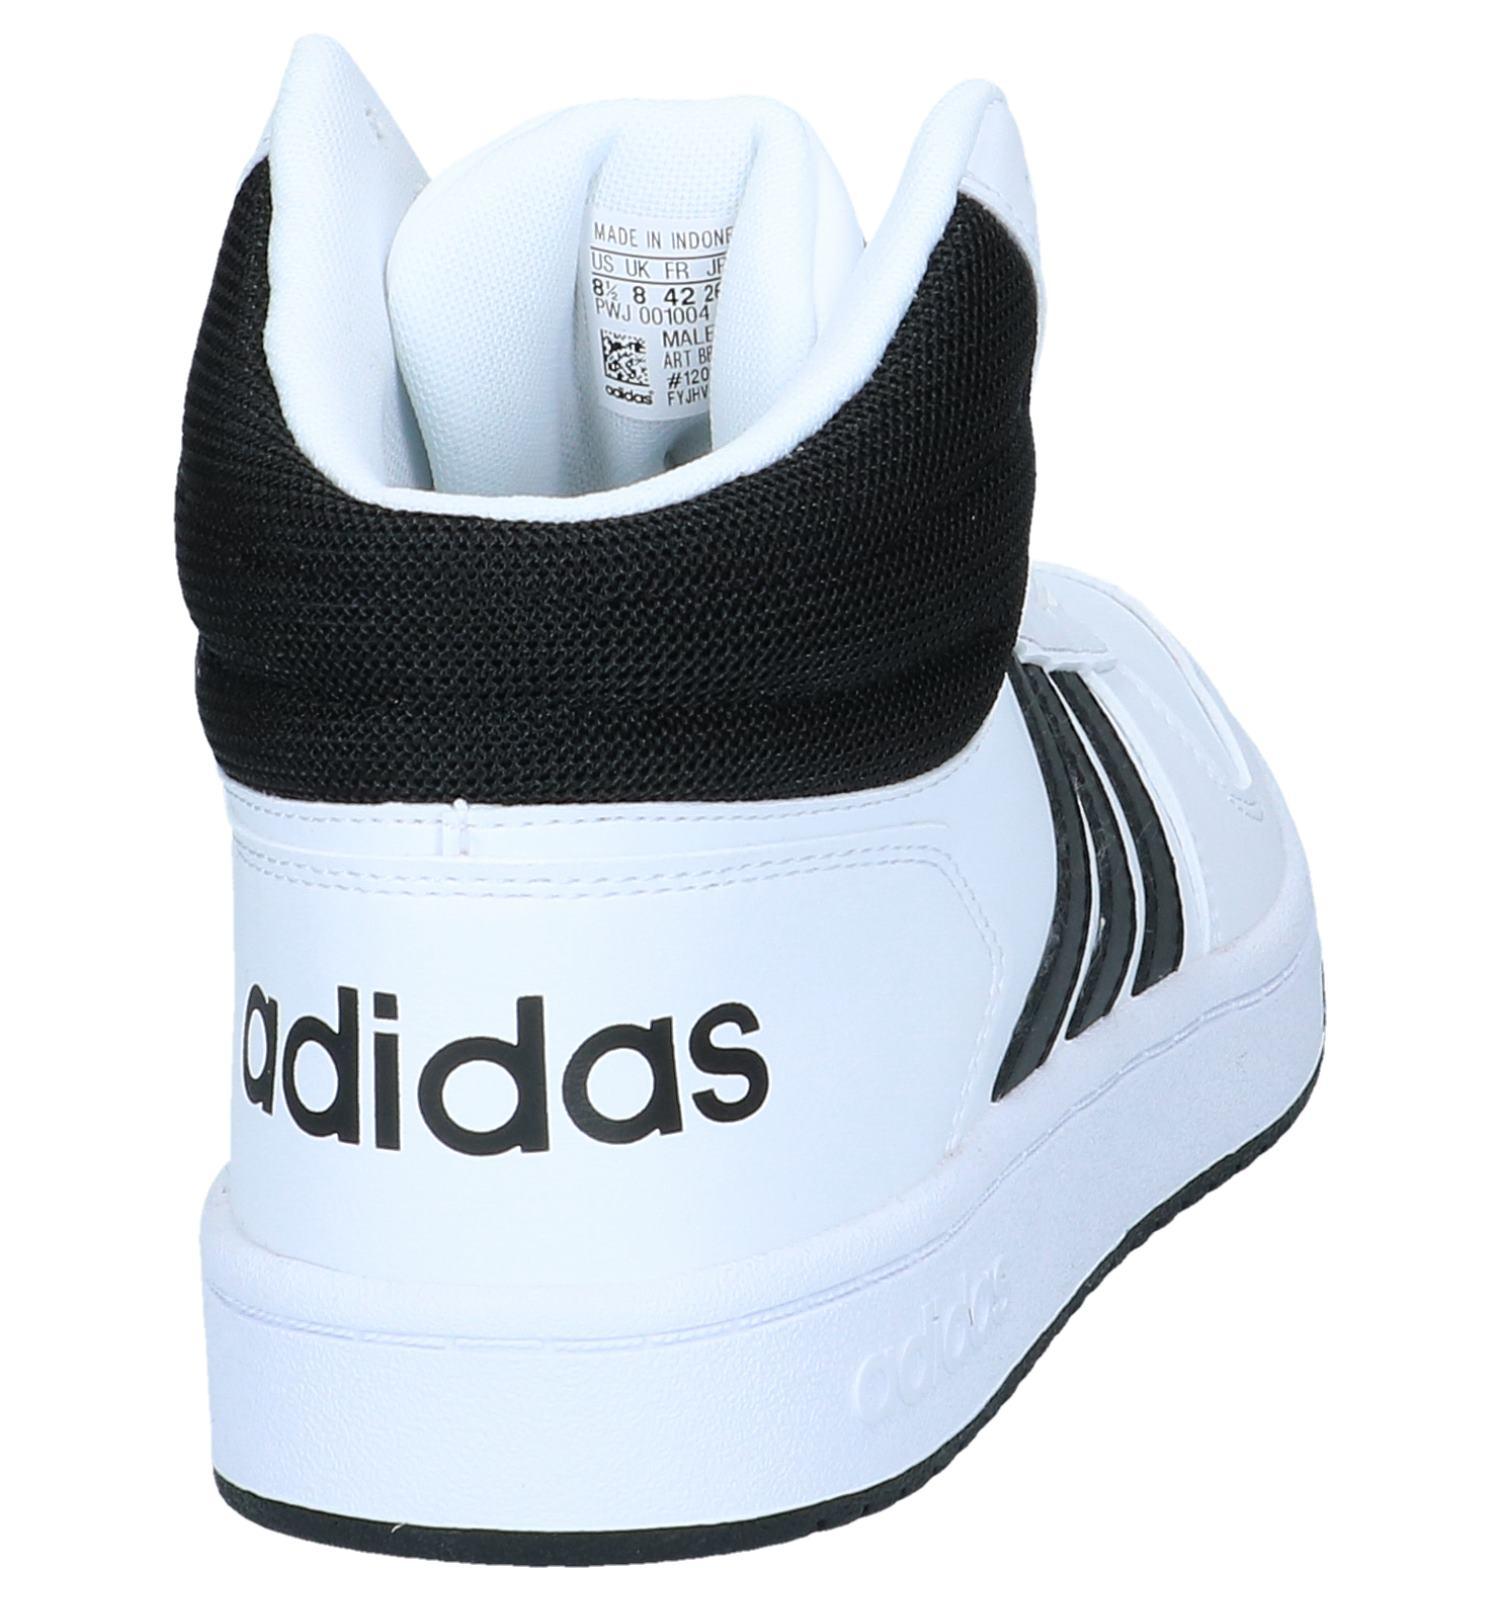 Witte Hoge Sneakers adidas Hoops 2.0 | SCHOENENTORFS.NL